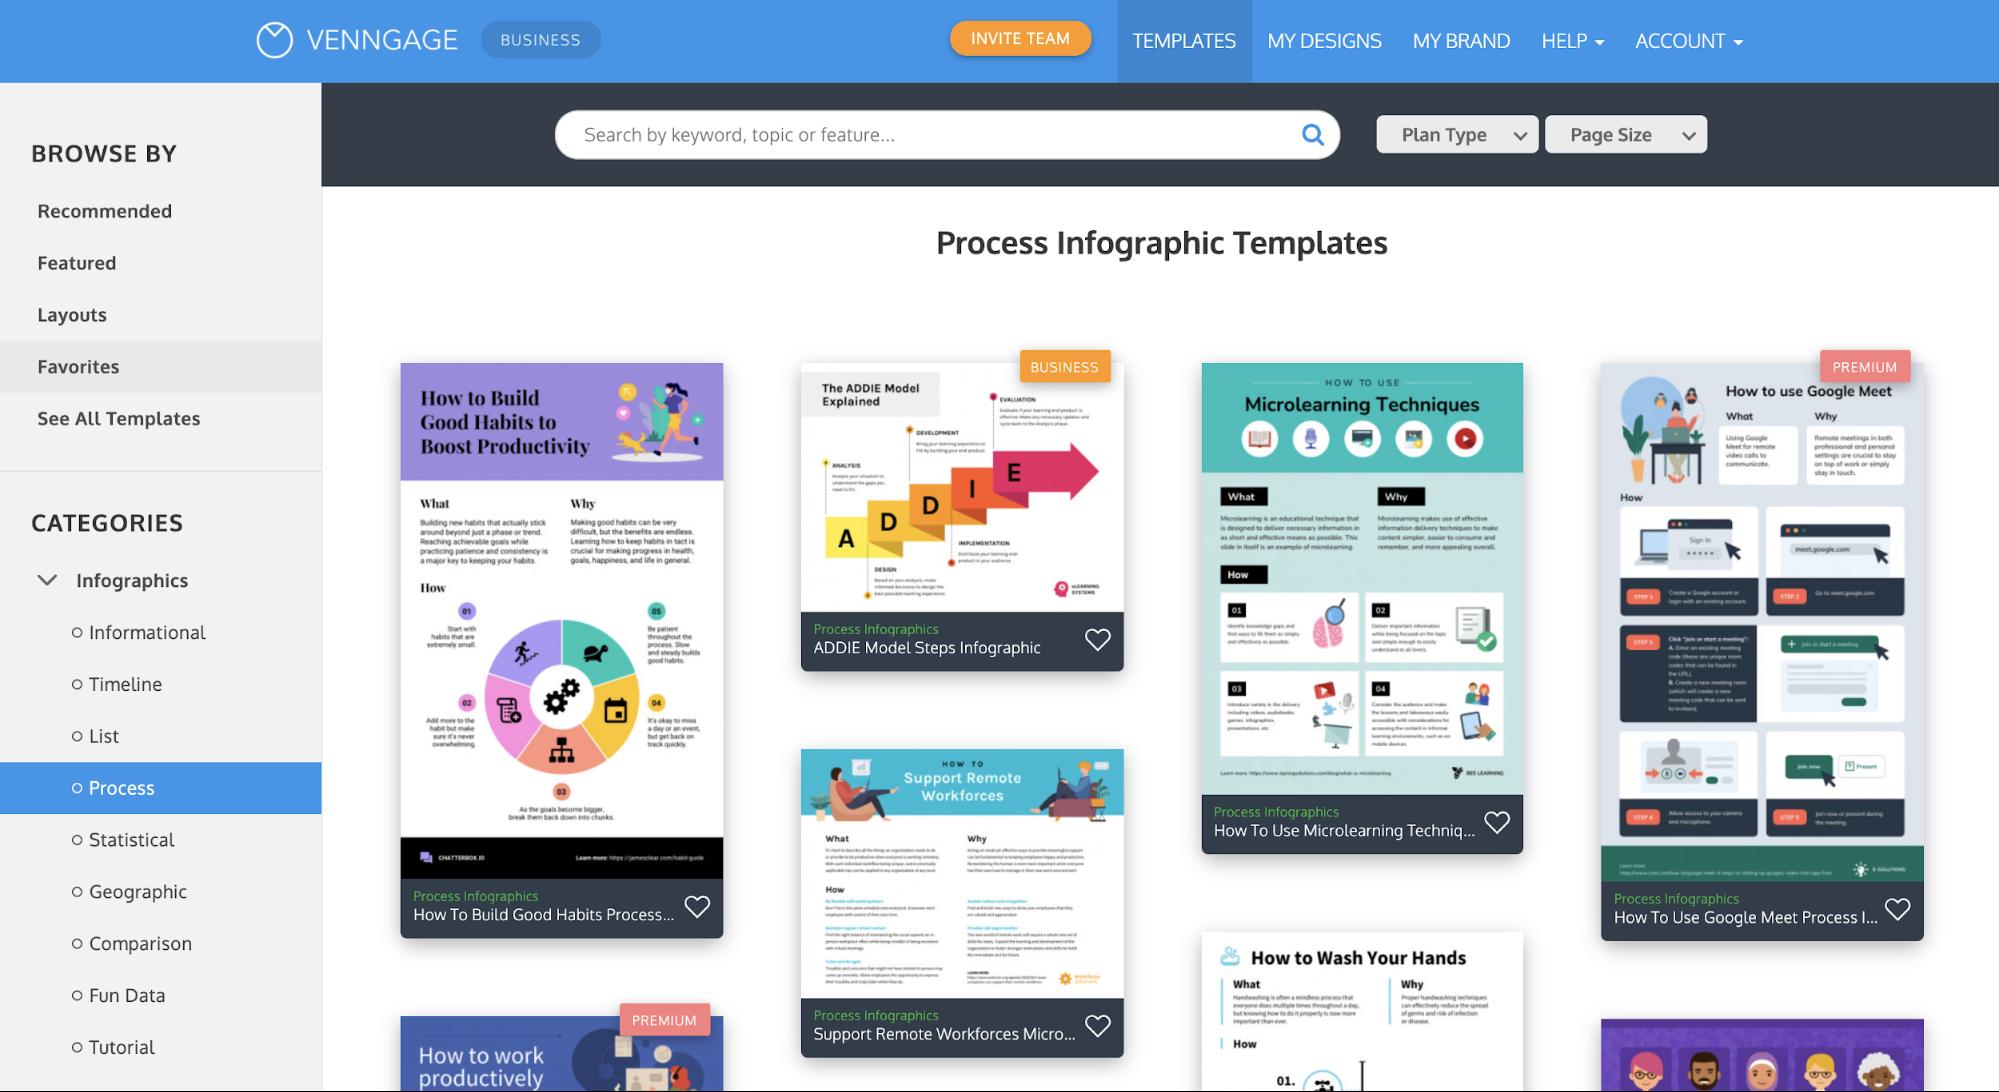 Venngage vs Visme Venngage Process Infographic Templates